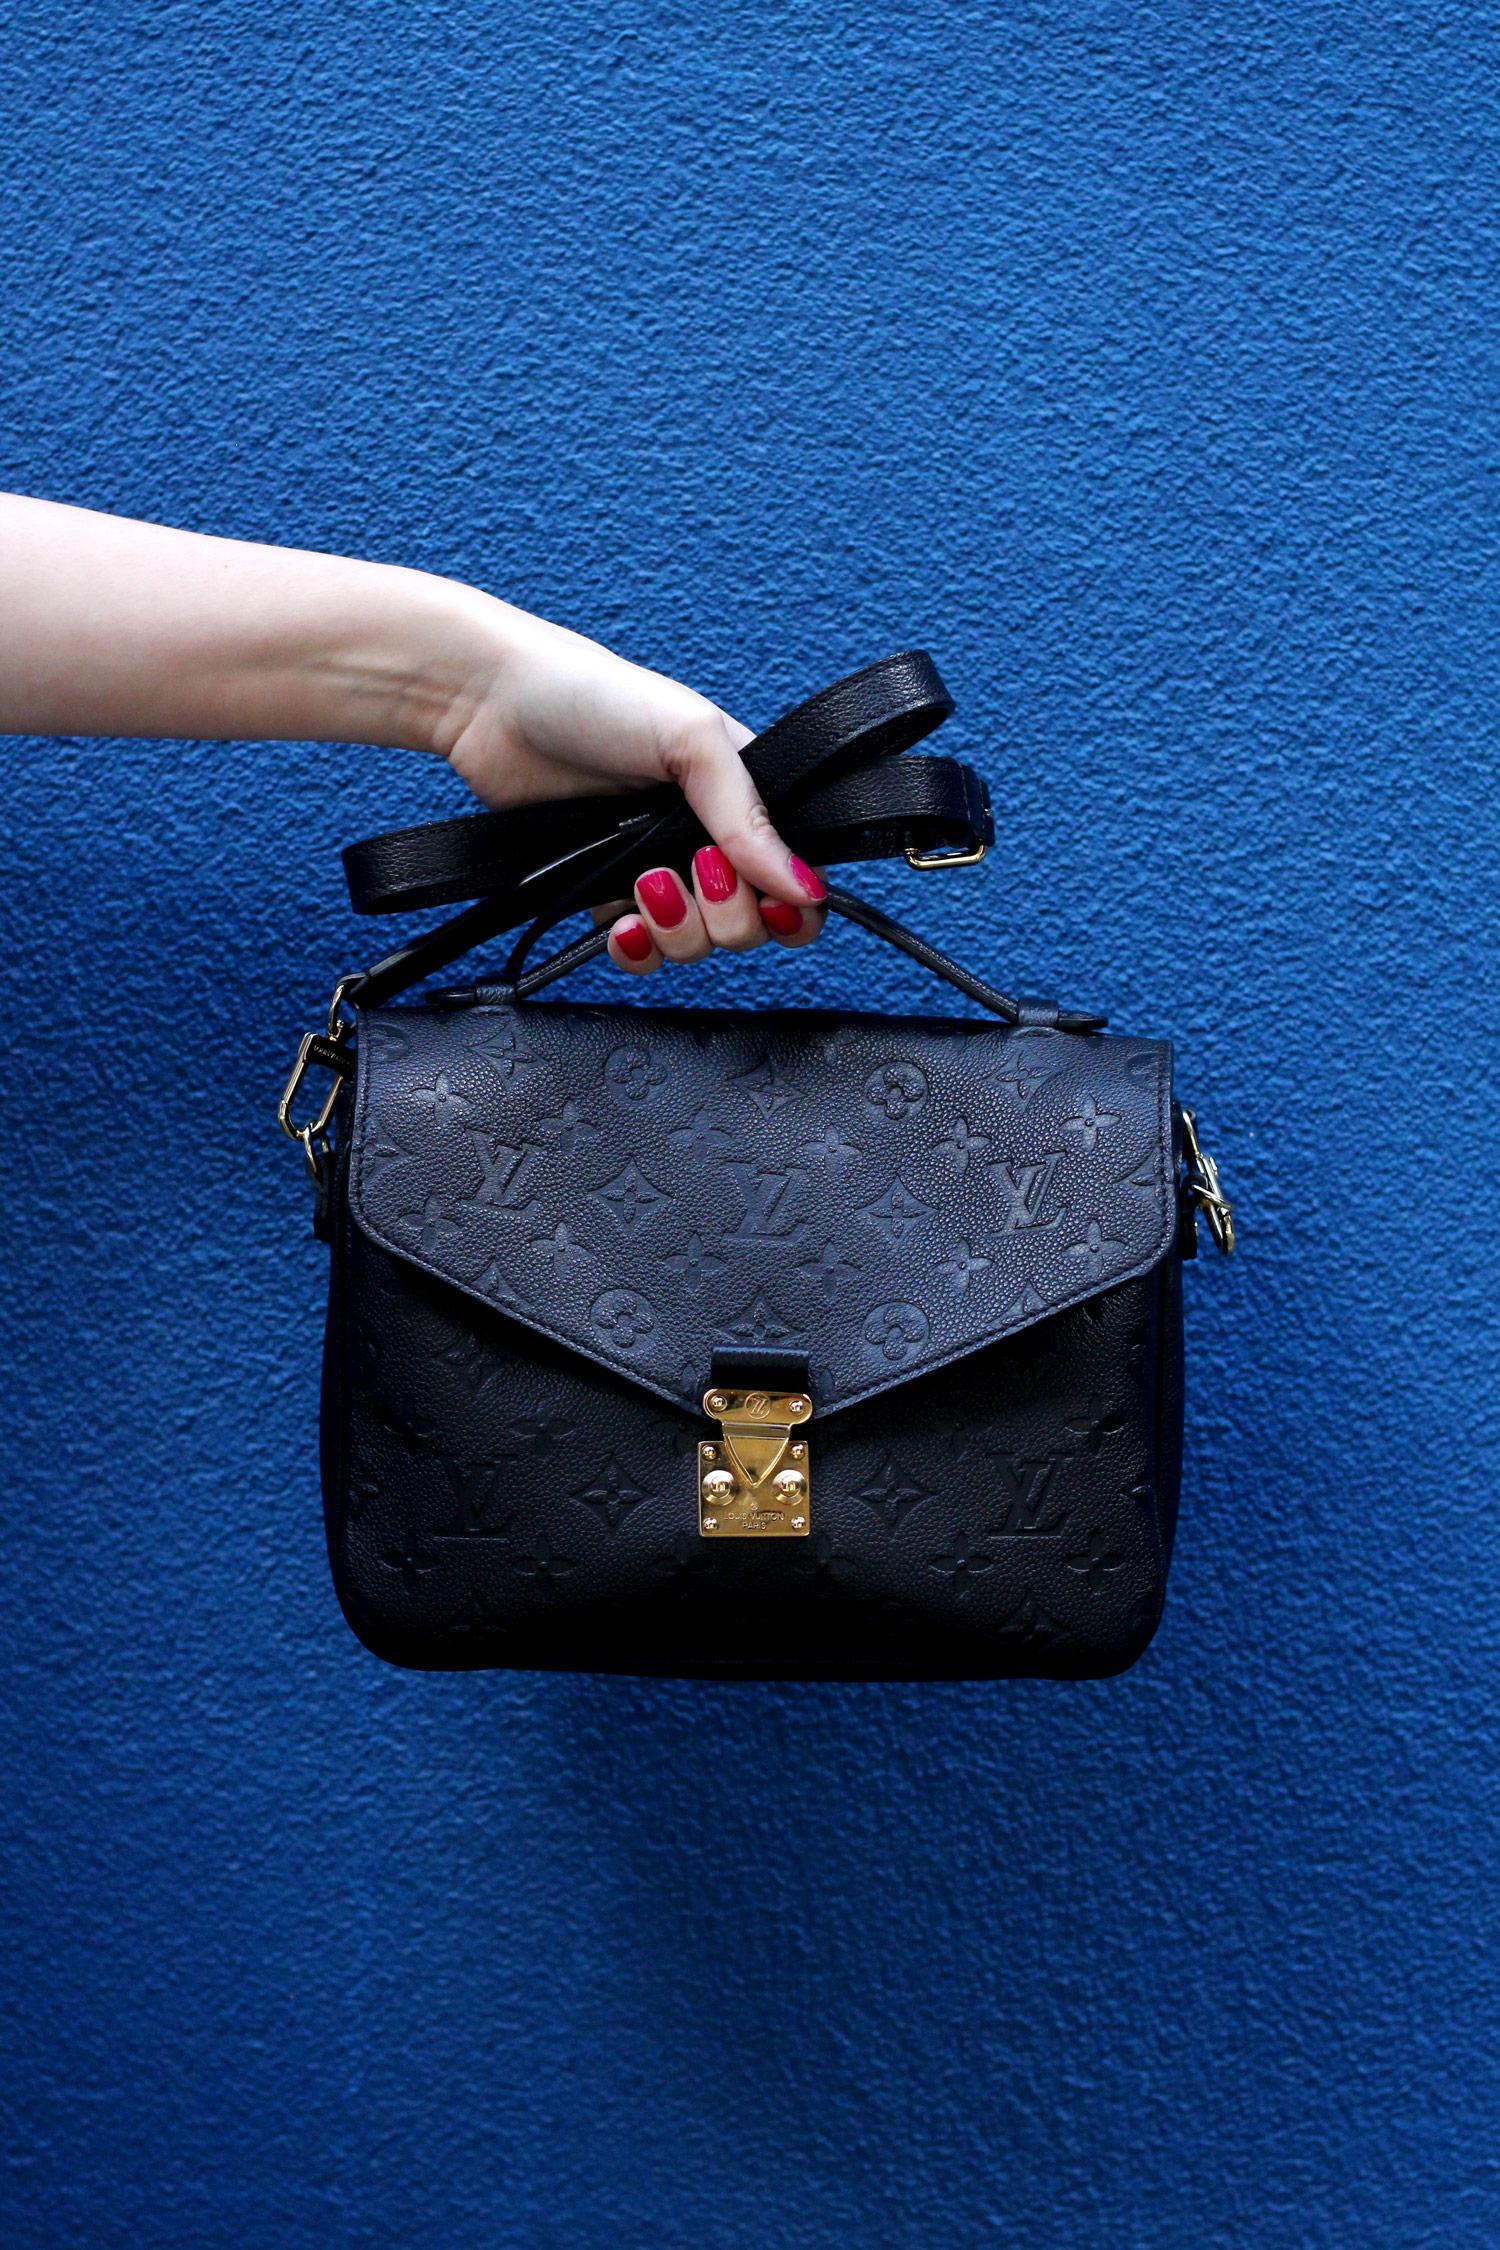 closet-london-leather-skirt-grey-cardgain-louis-vuitton-pochette-metis-12